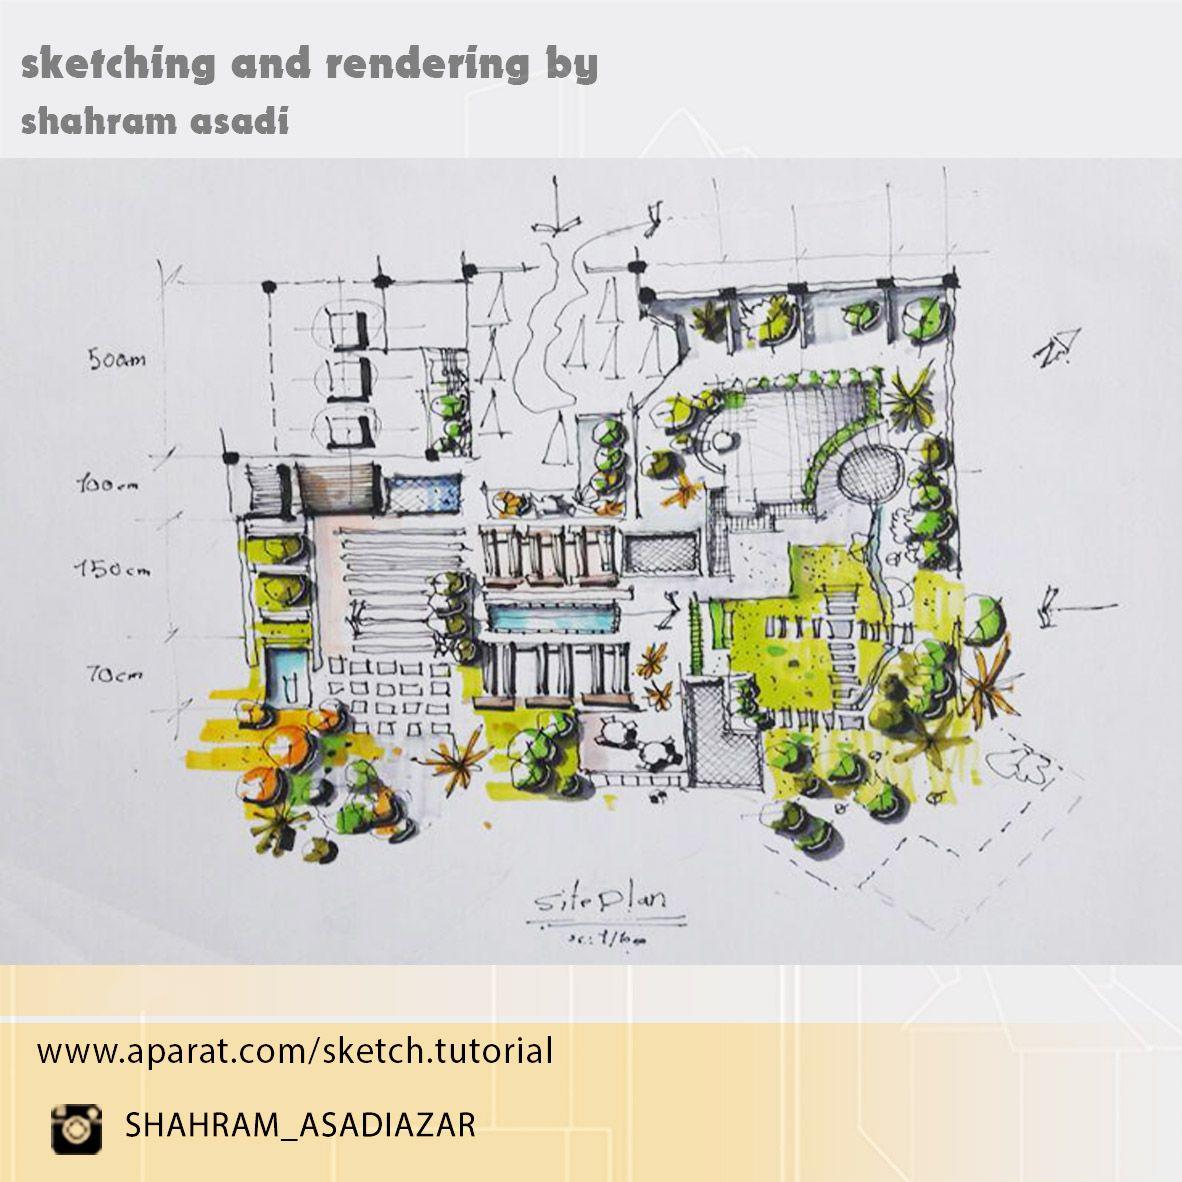 medium resolution of site plan sketch